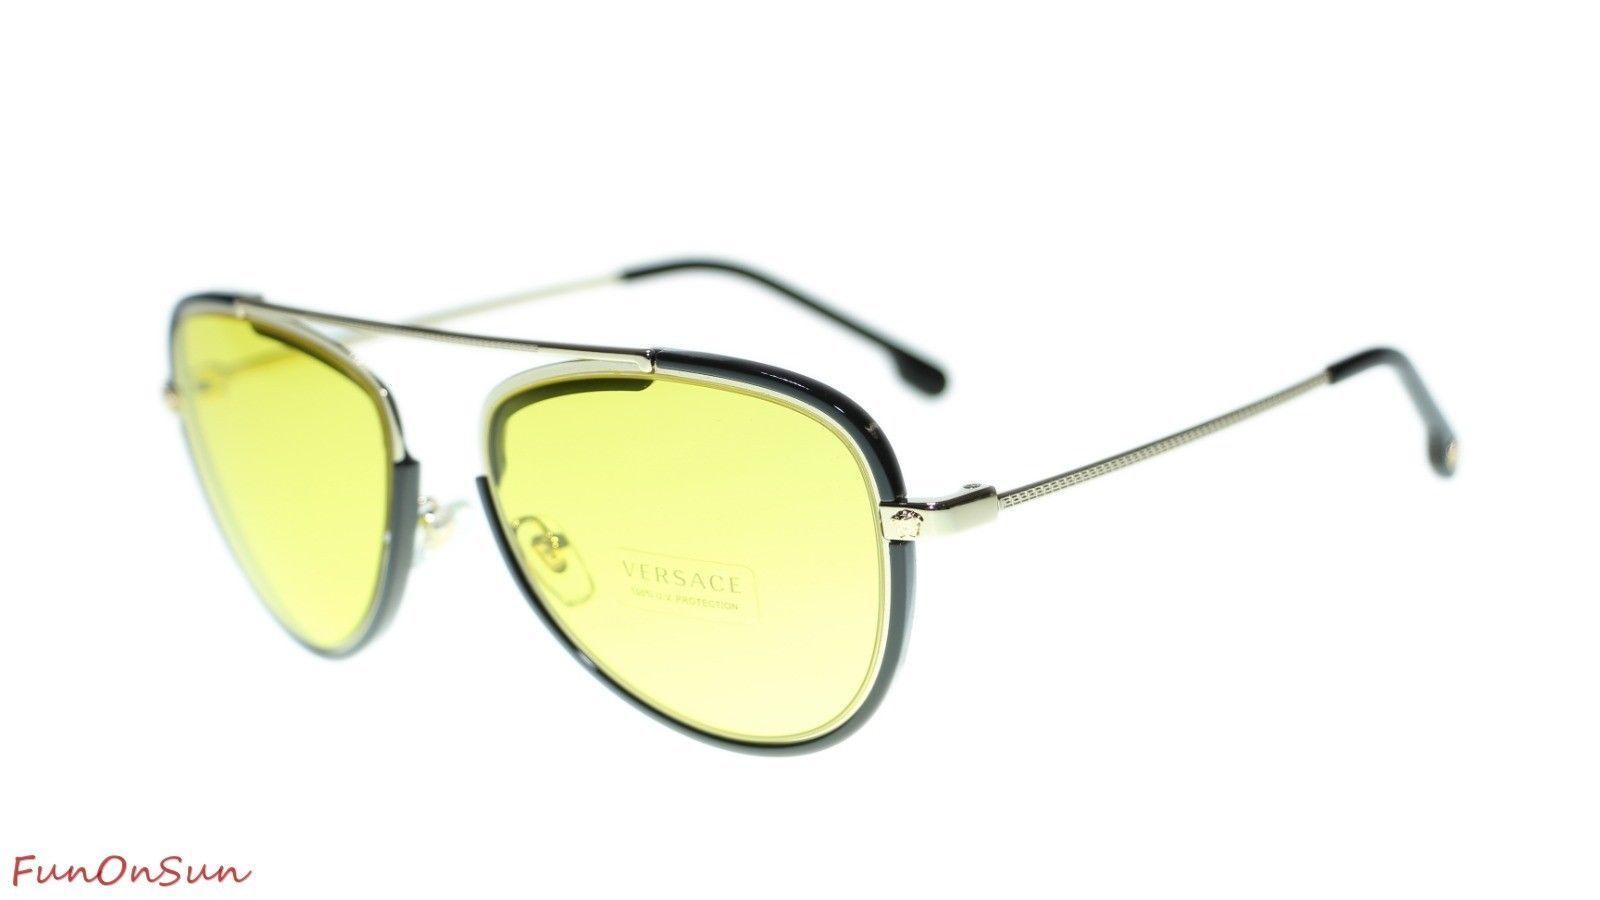 0e21fc744ef Versace Men Pilot Sunglasses VE2193 125285 and 23 similar items. 10